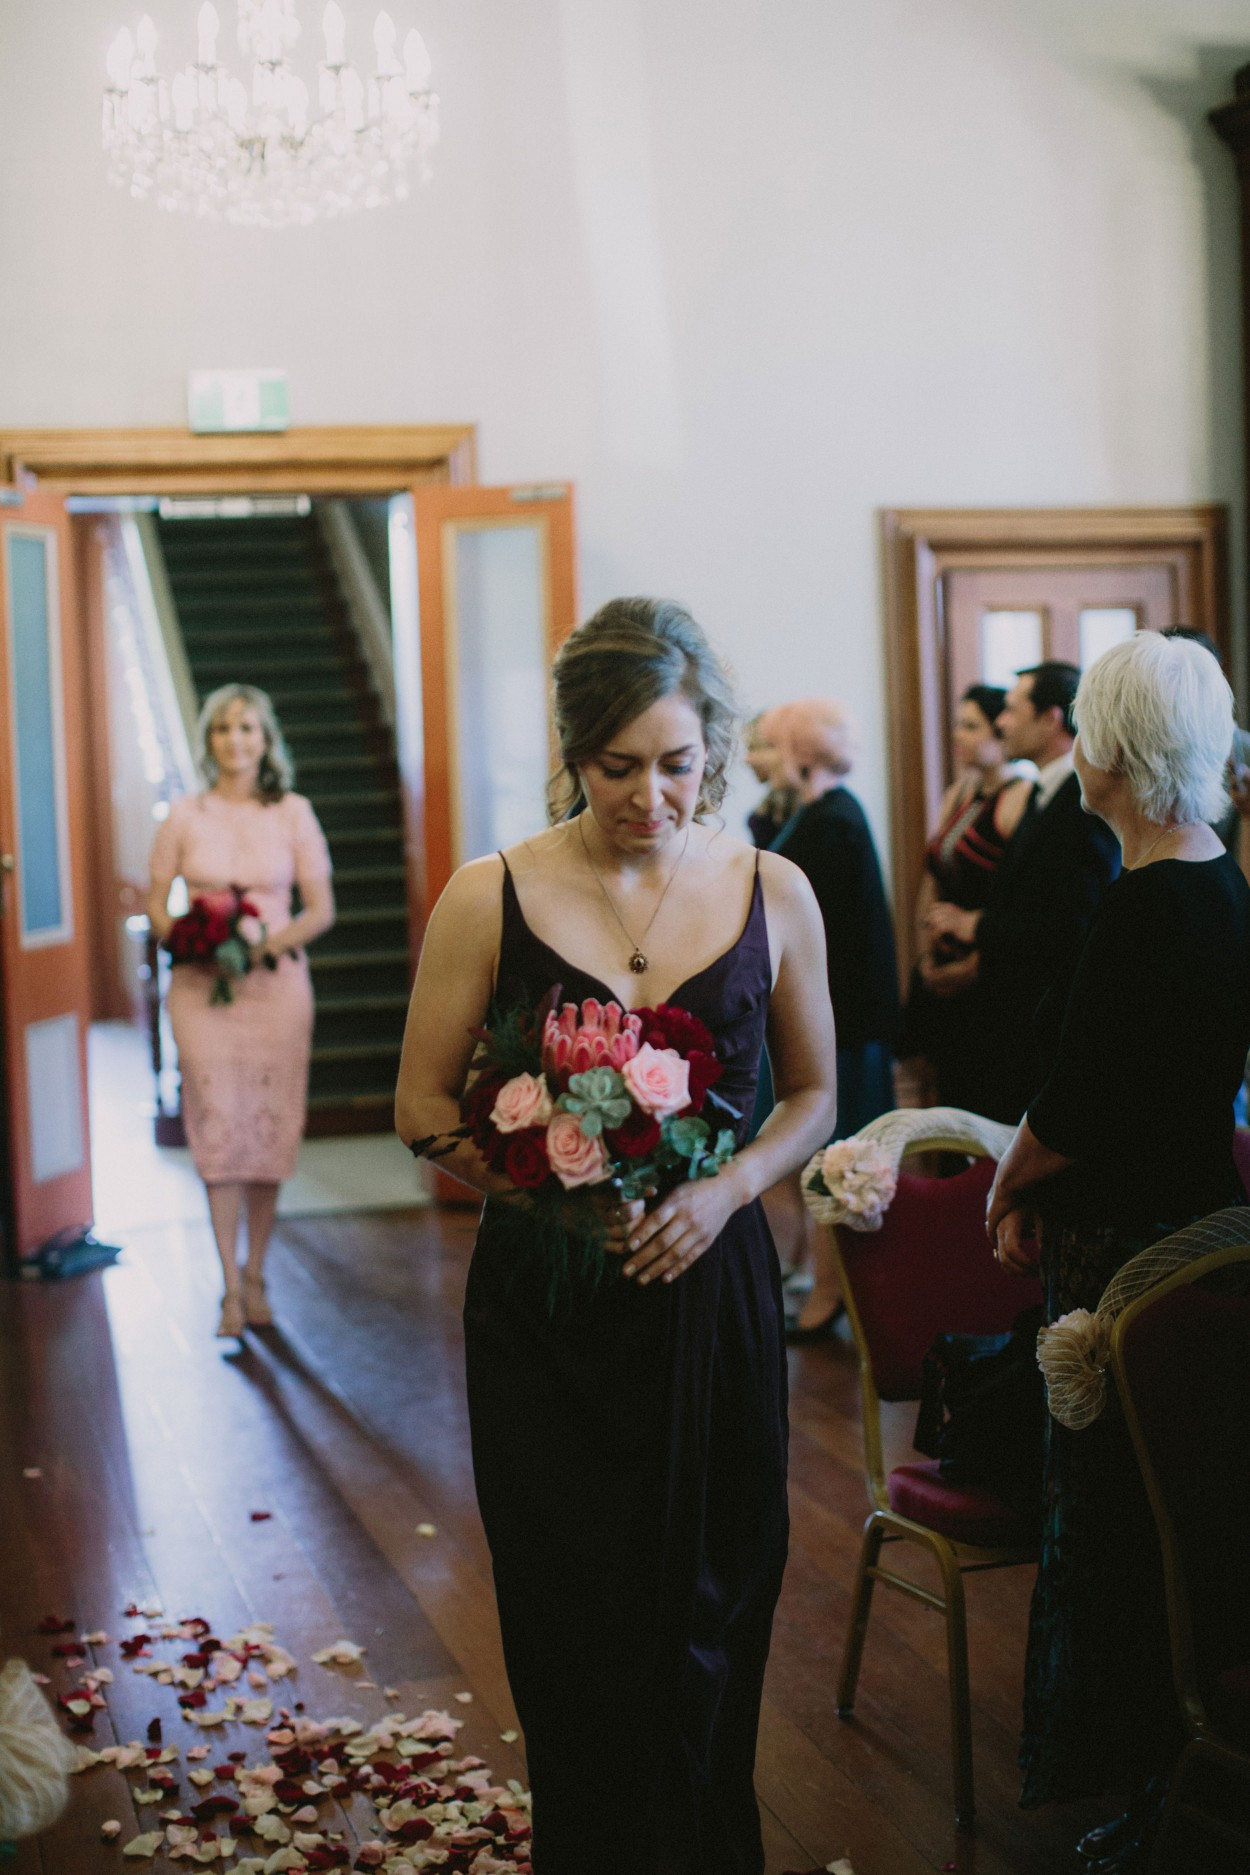 I-Got-You-Babe-Weddings-Fitzroy-Town-Hall-Lauren-Hugo046.jpg